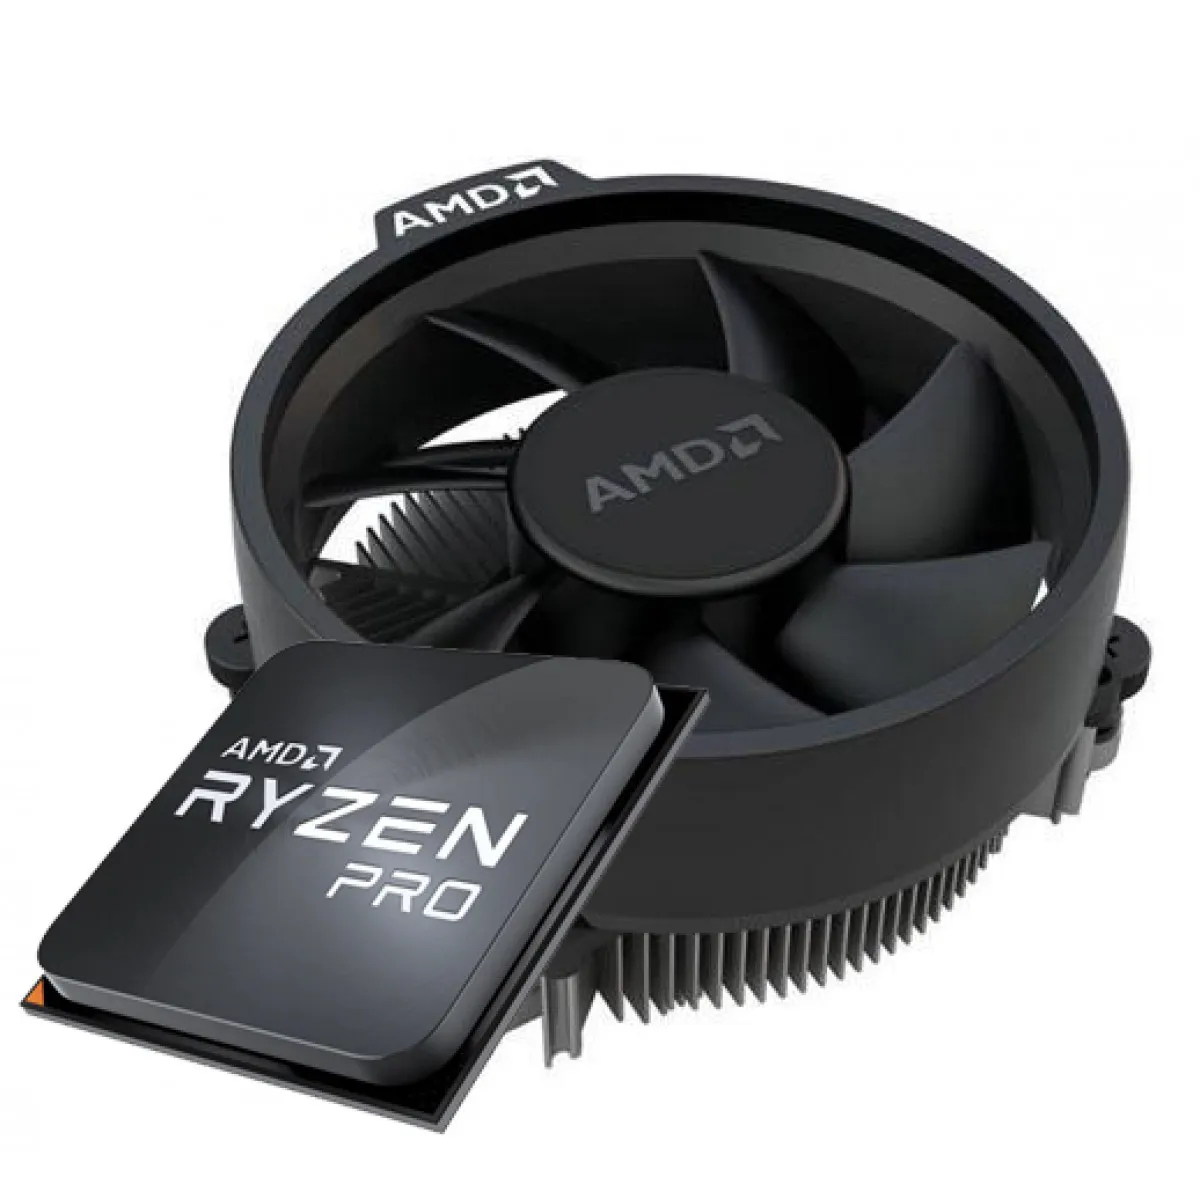 Processador AMD Ryzen 3 2200G PRO 3.5GHz (3.7GHz Turbo), 4-Cores 4-Threads, Cooler Wraith Stealth, AM4, YD220BC5FBMPK, OEM